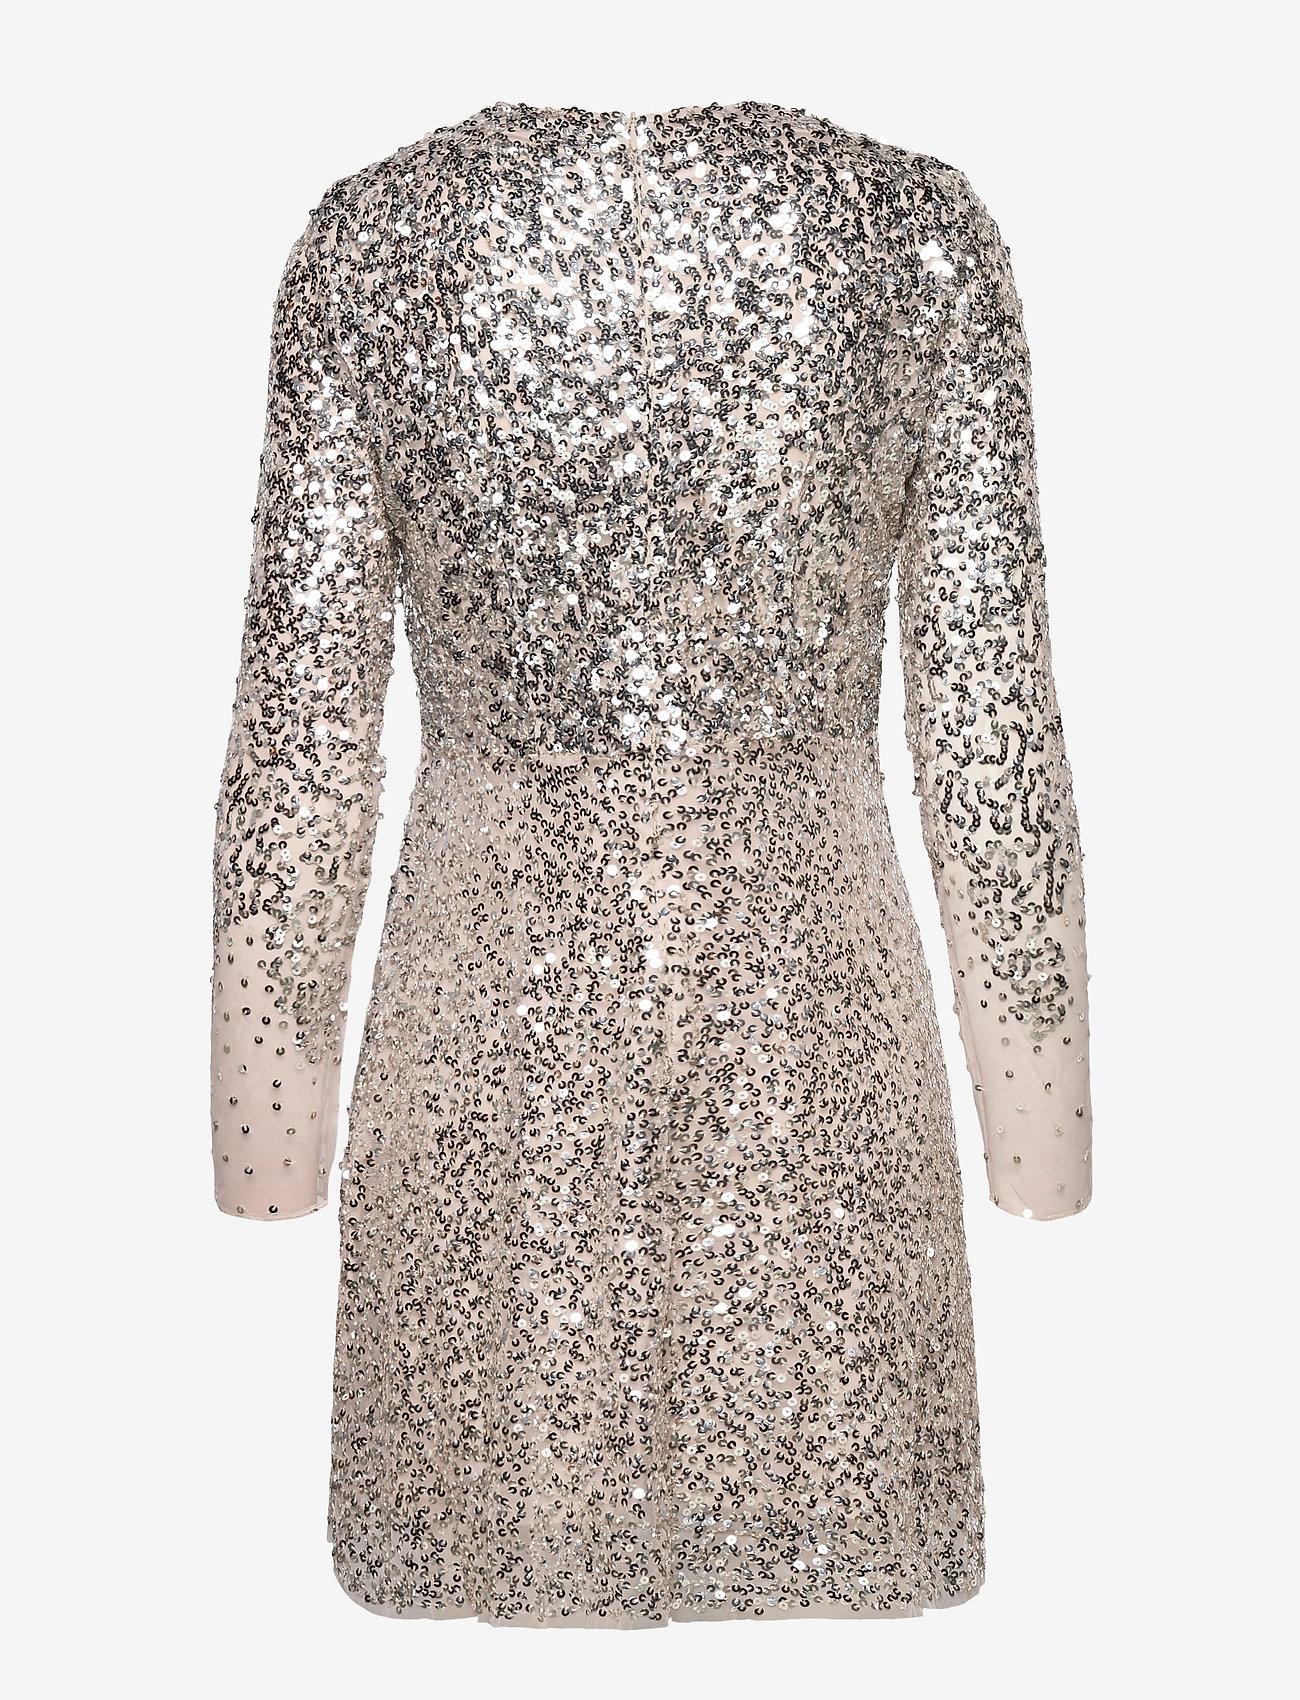 French Connection - EMILLE SPARKLE SHORT DRESS - paljettkjoler - silver/nude - 1